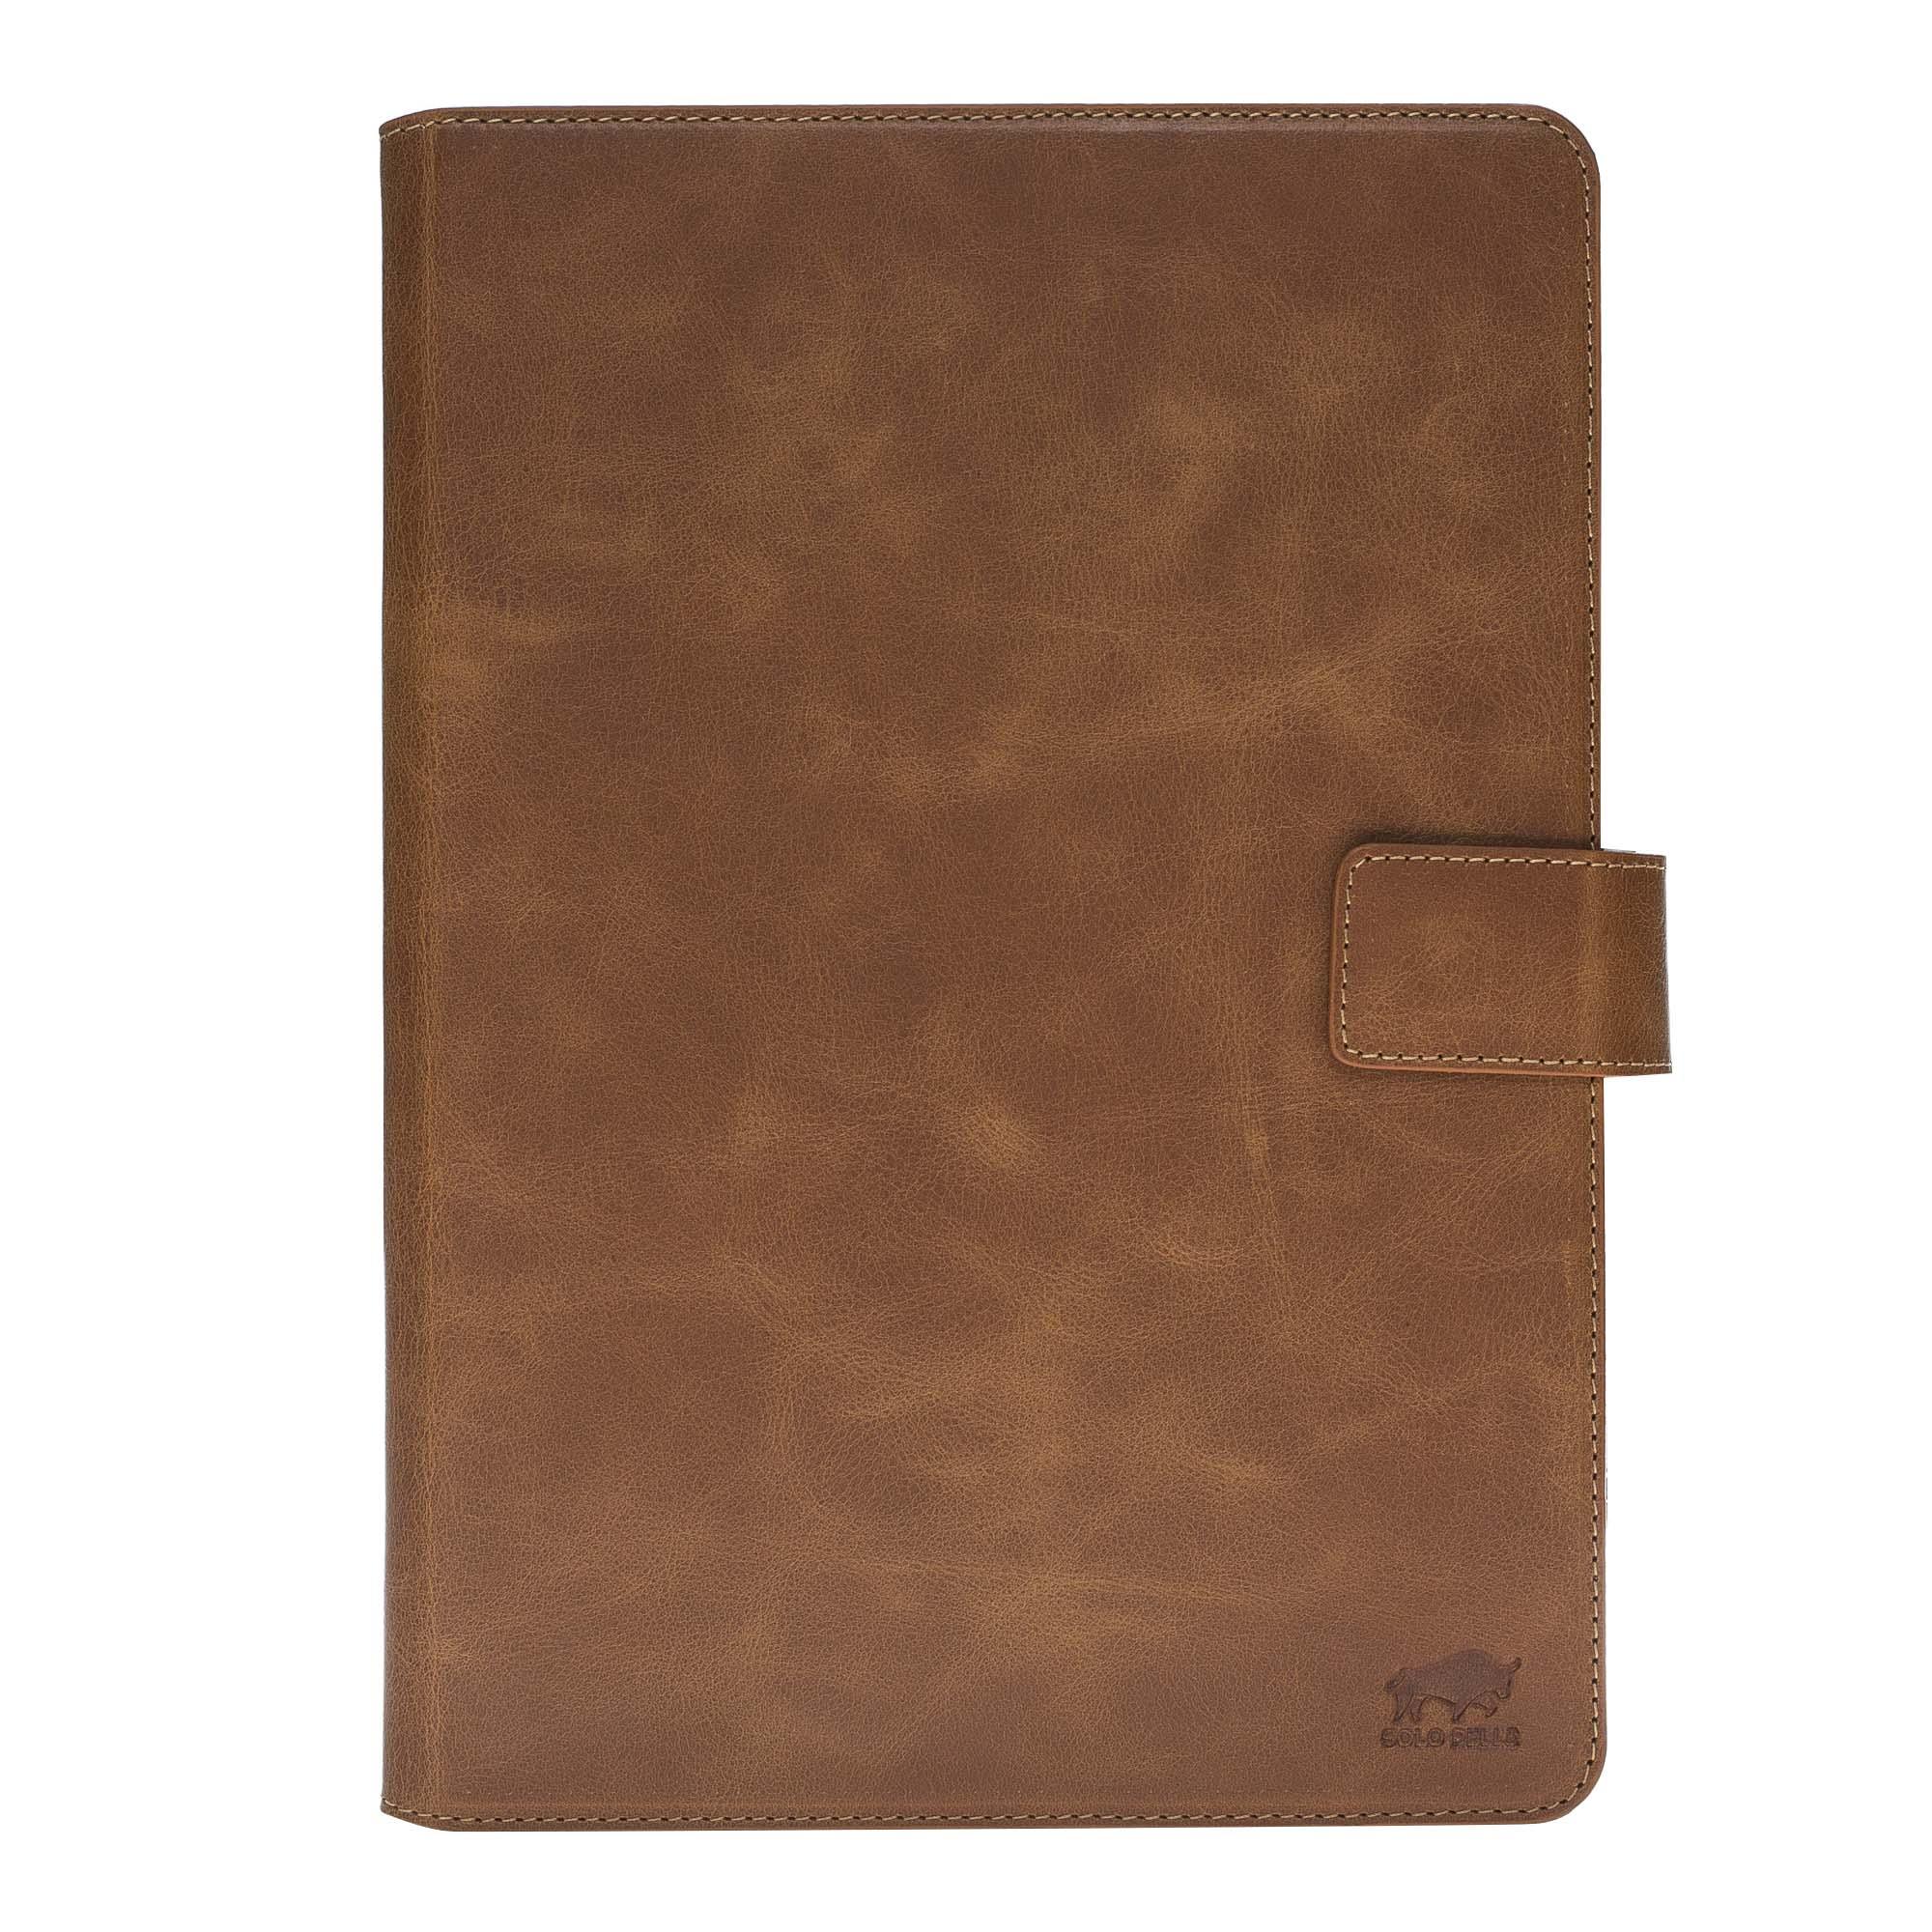 iPad Pro 10.5 Zoll Ledertasche in Cognac Braun